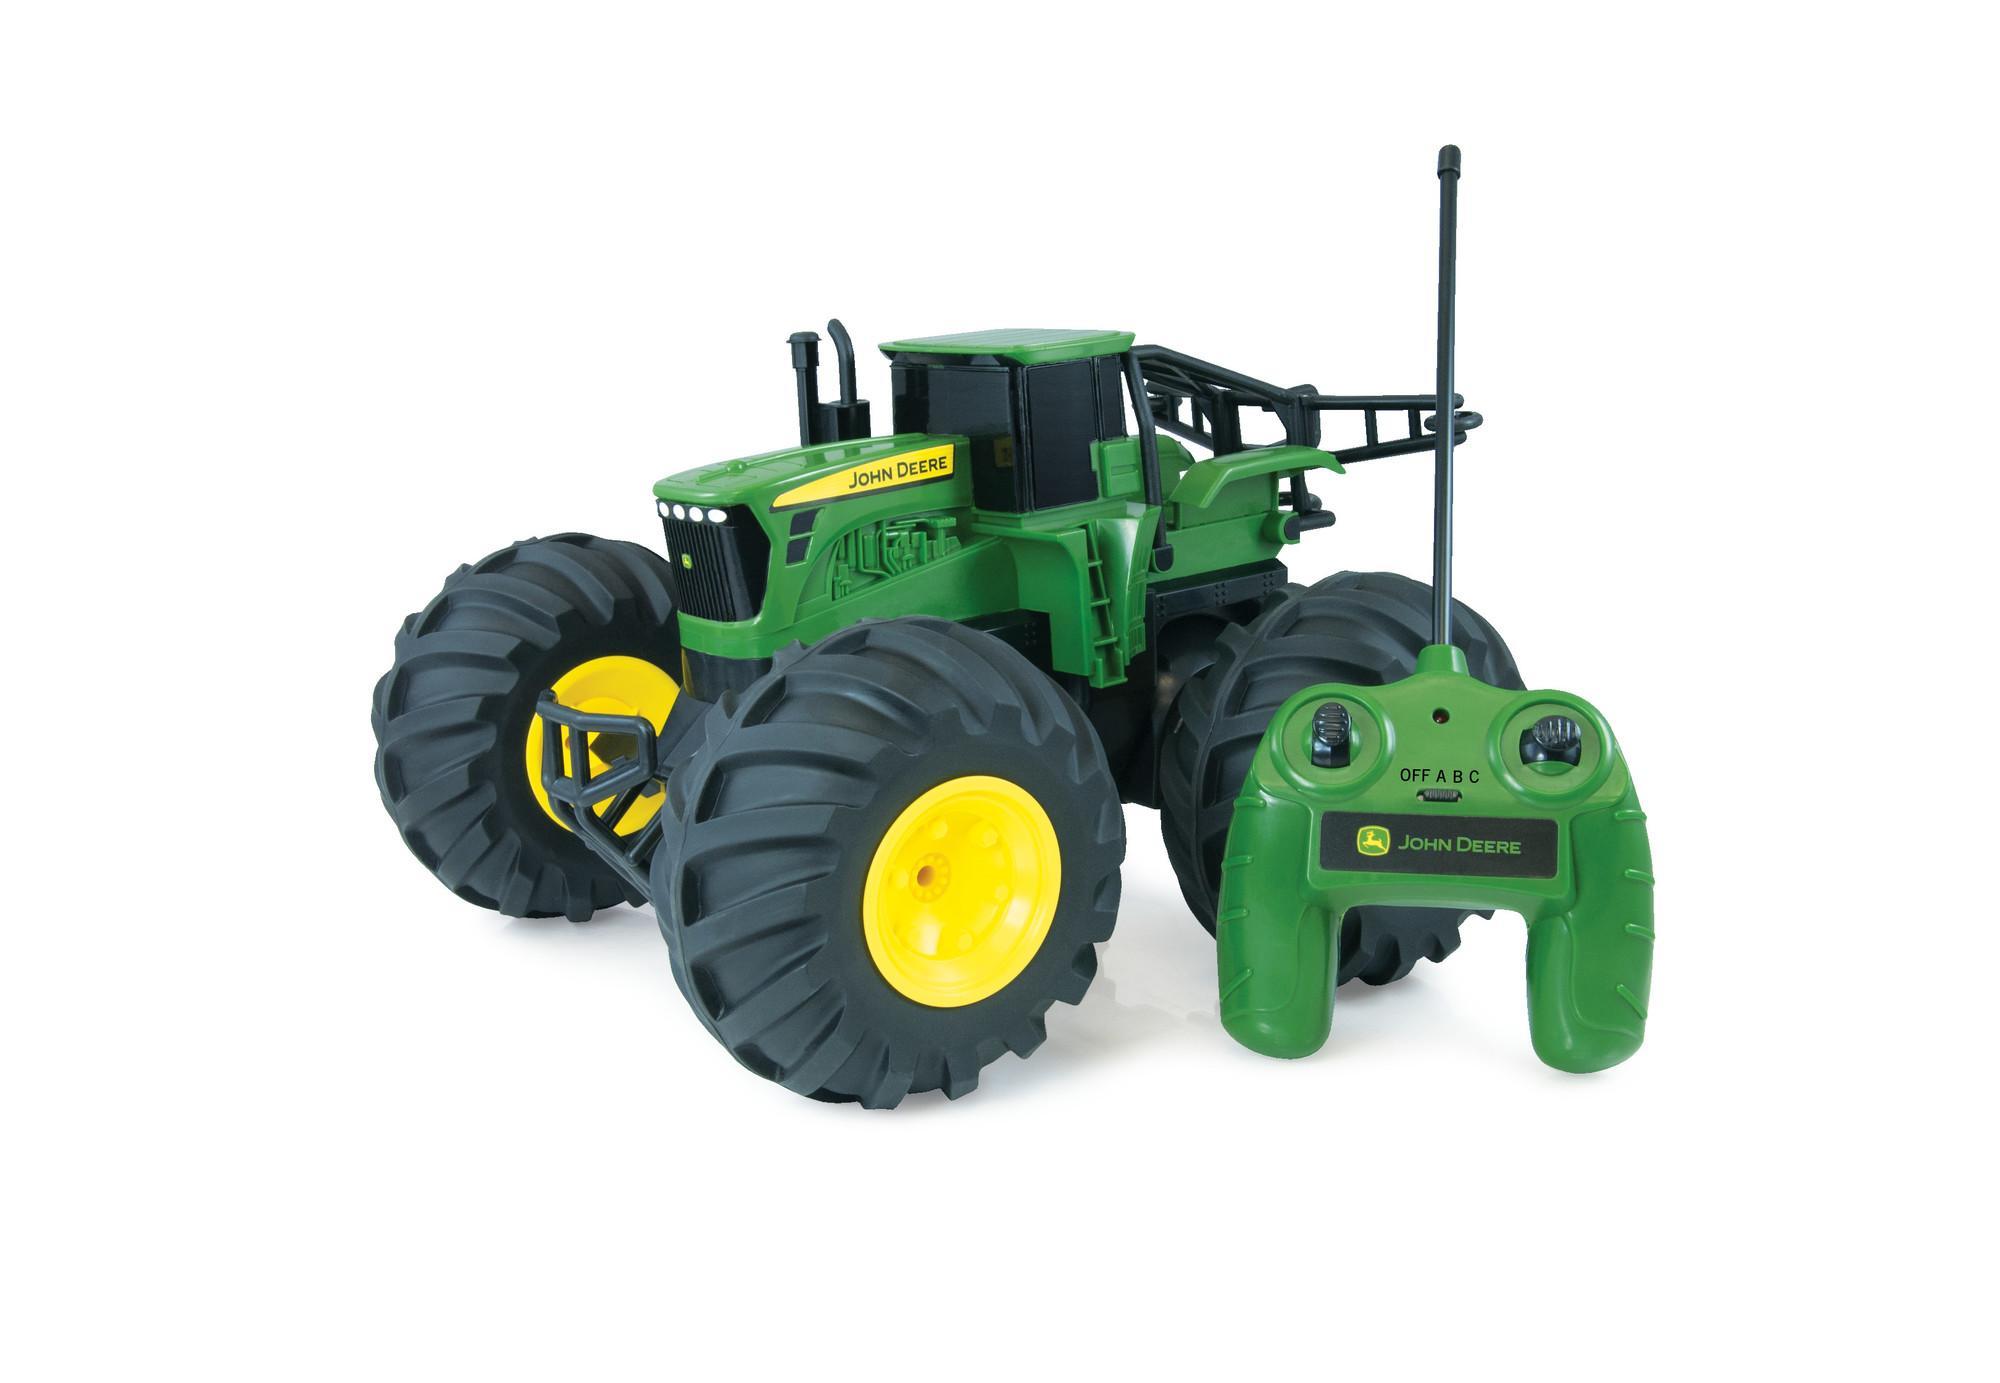 tomy traktor rc john deere monster treads in gr n robuster und flexibler ferngesteuerter. Black Bedroom Furniture Sets. Home Design Ideas